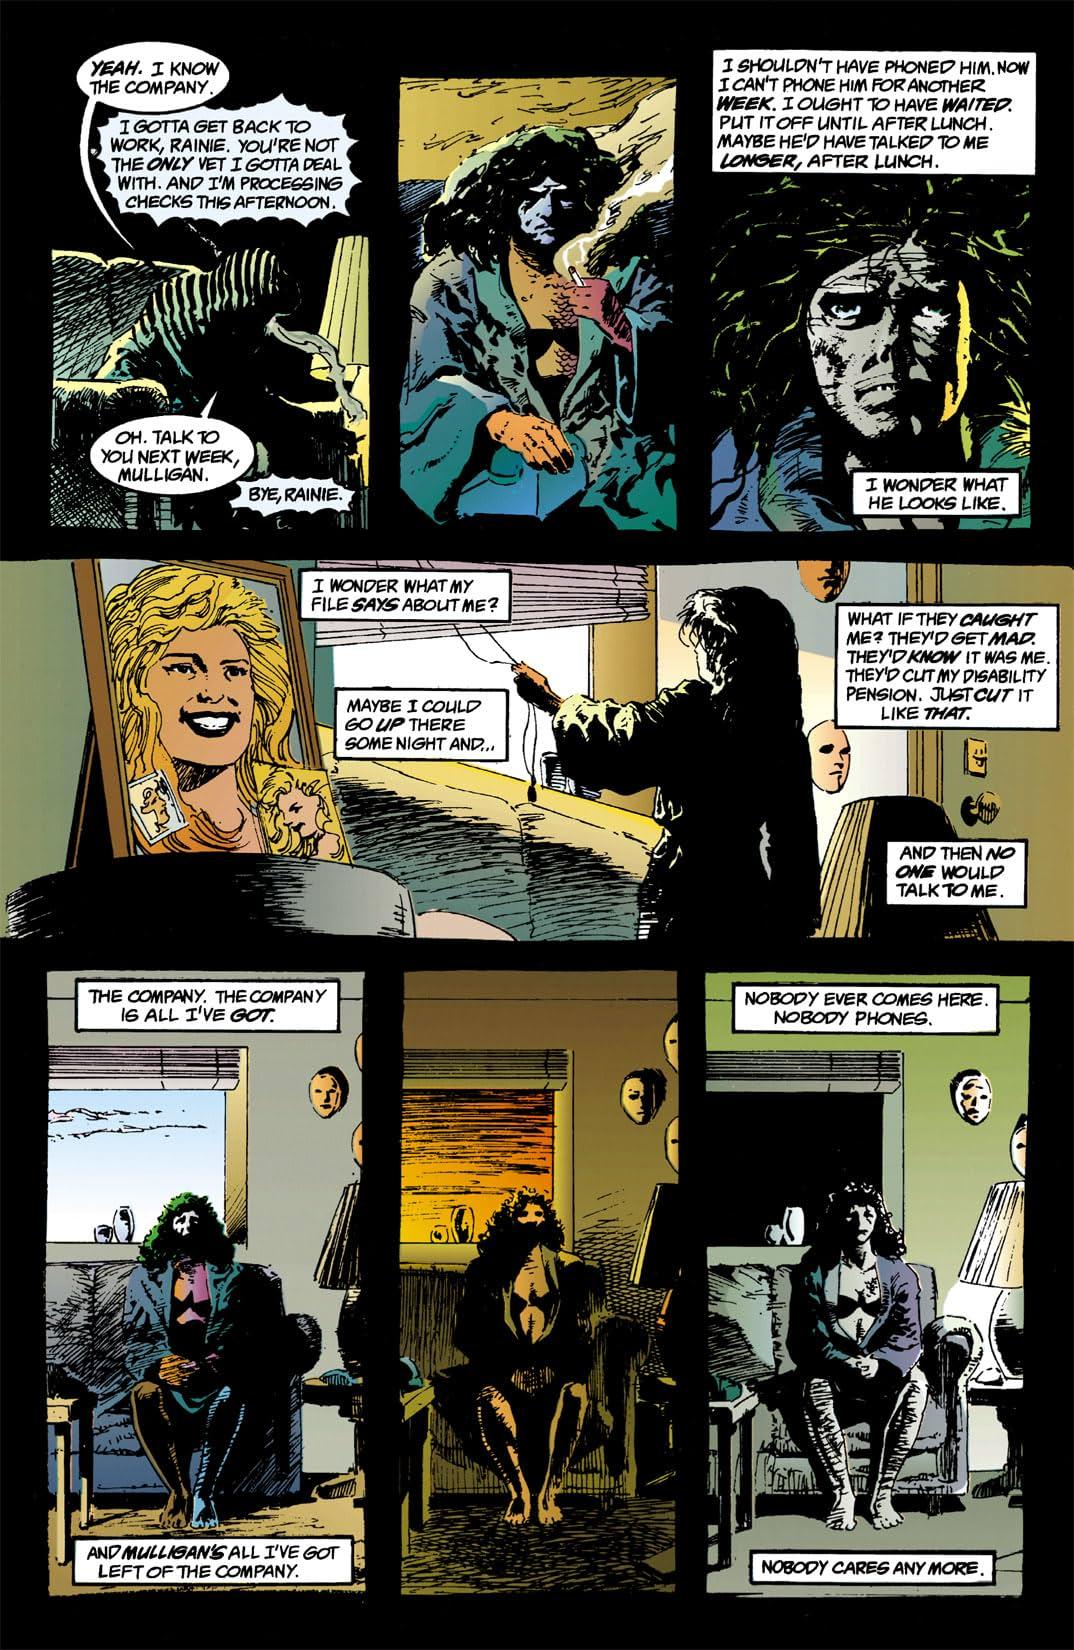 The Sandman #20